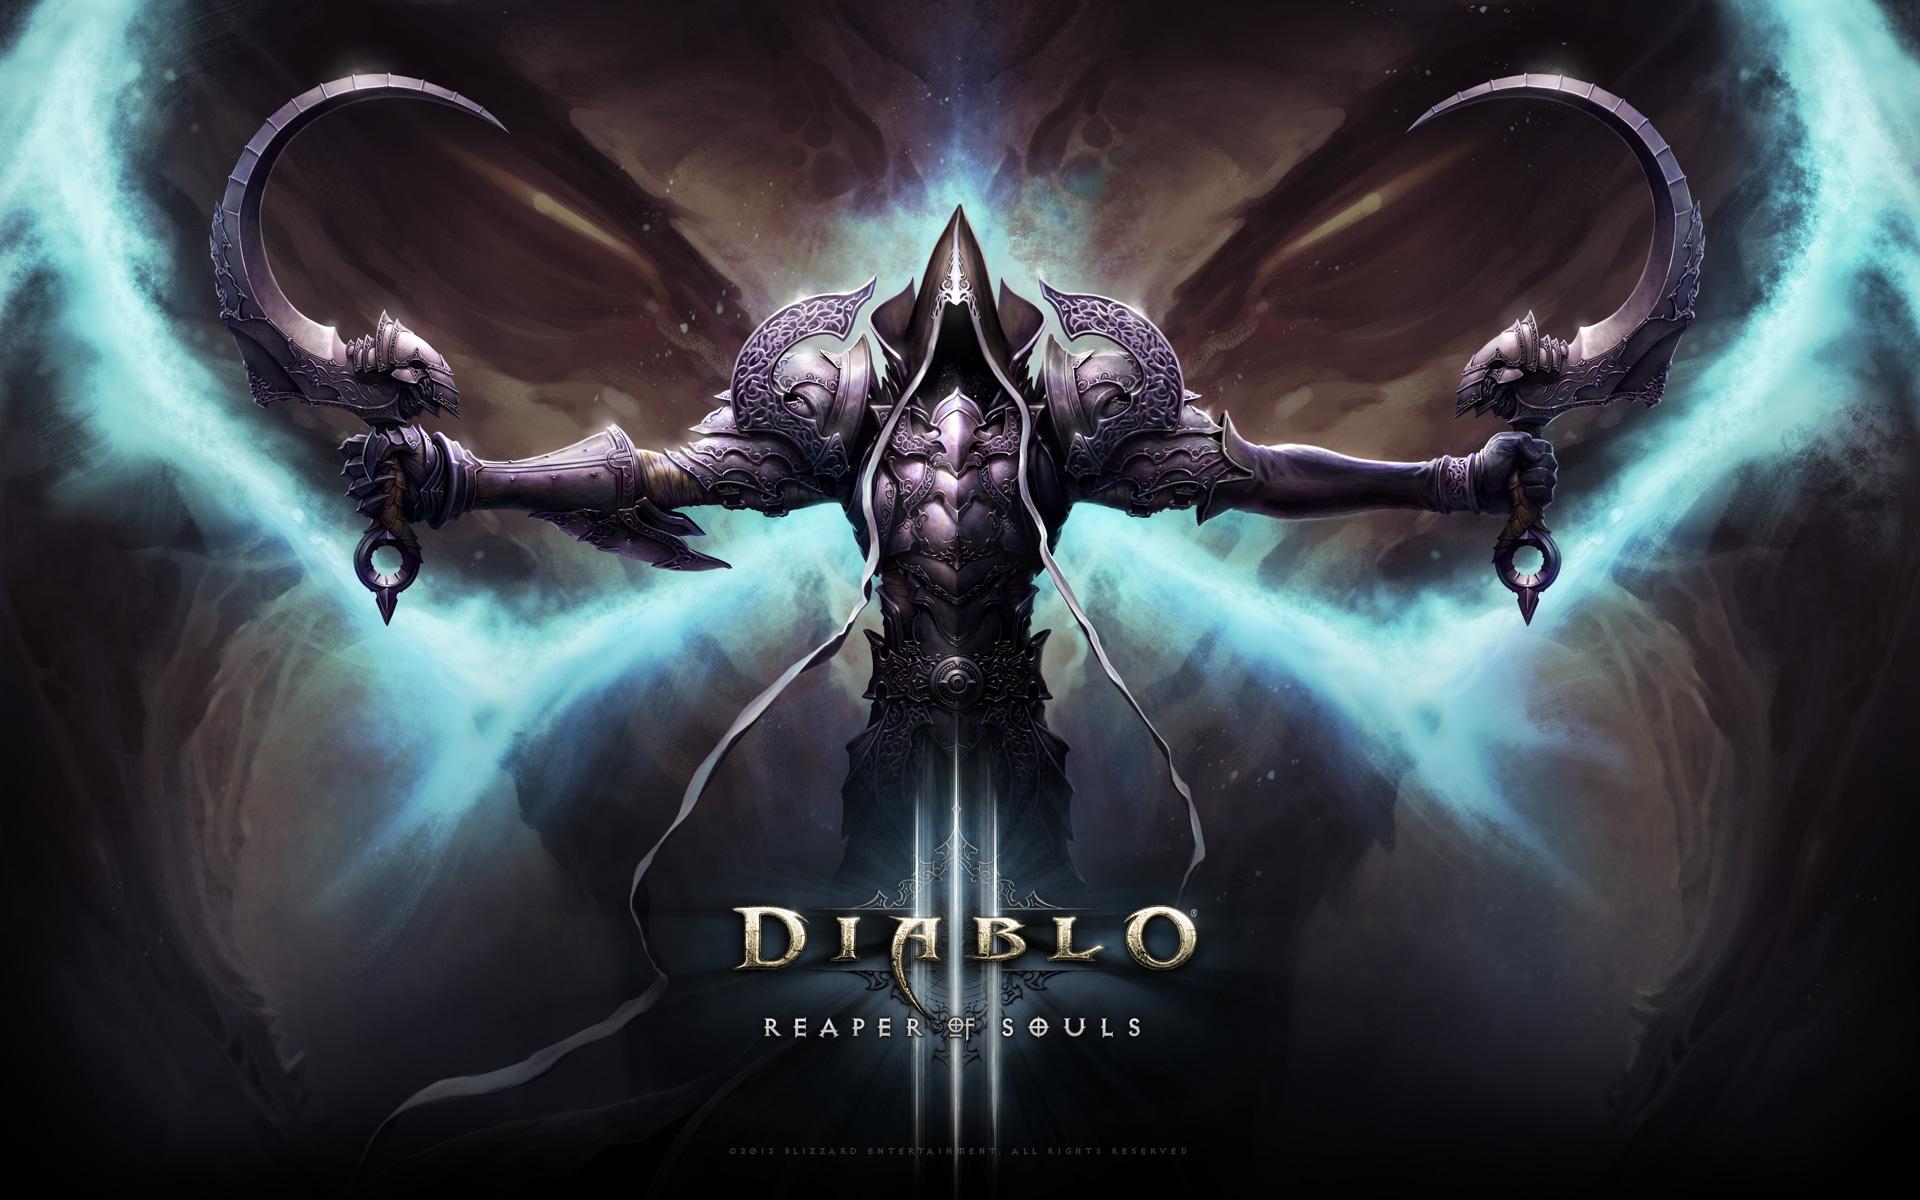 Photo of Diablo 3: Reaper of Souls, varianta scurta pentru neinitiati!